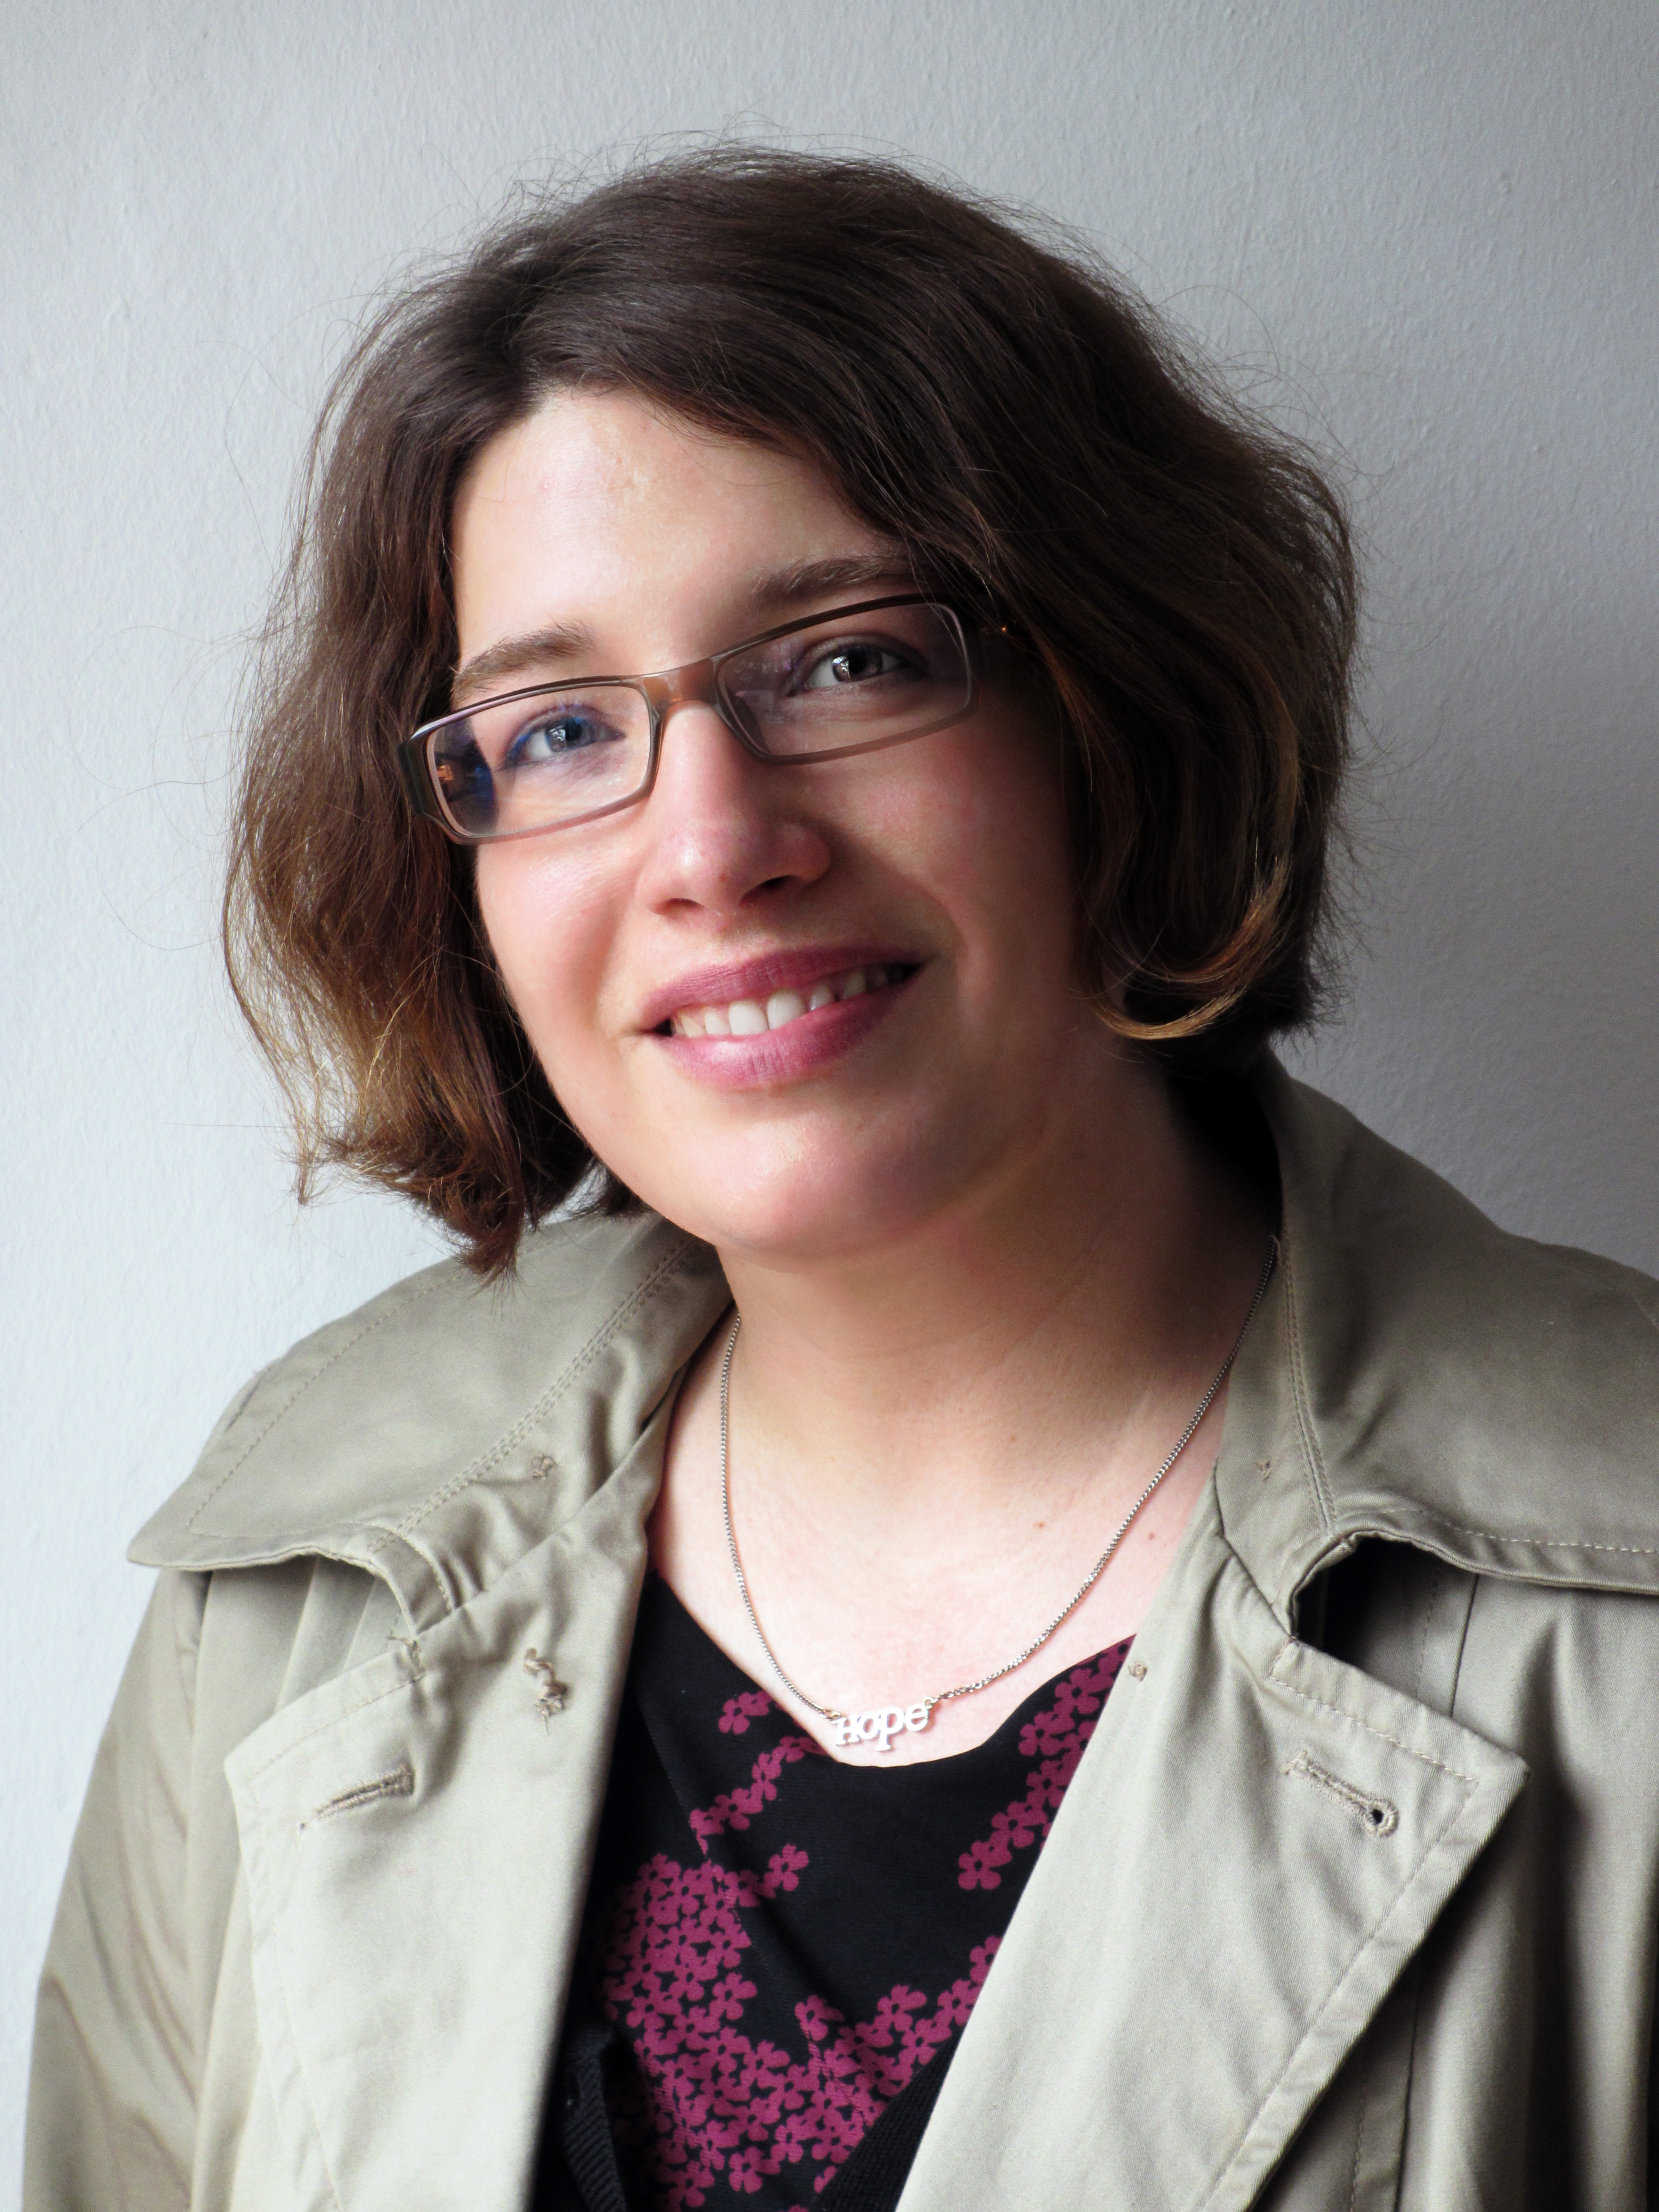 Pastorin Bettina Rutz